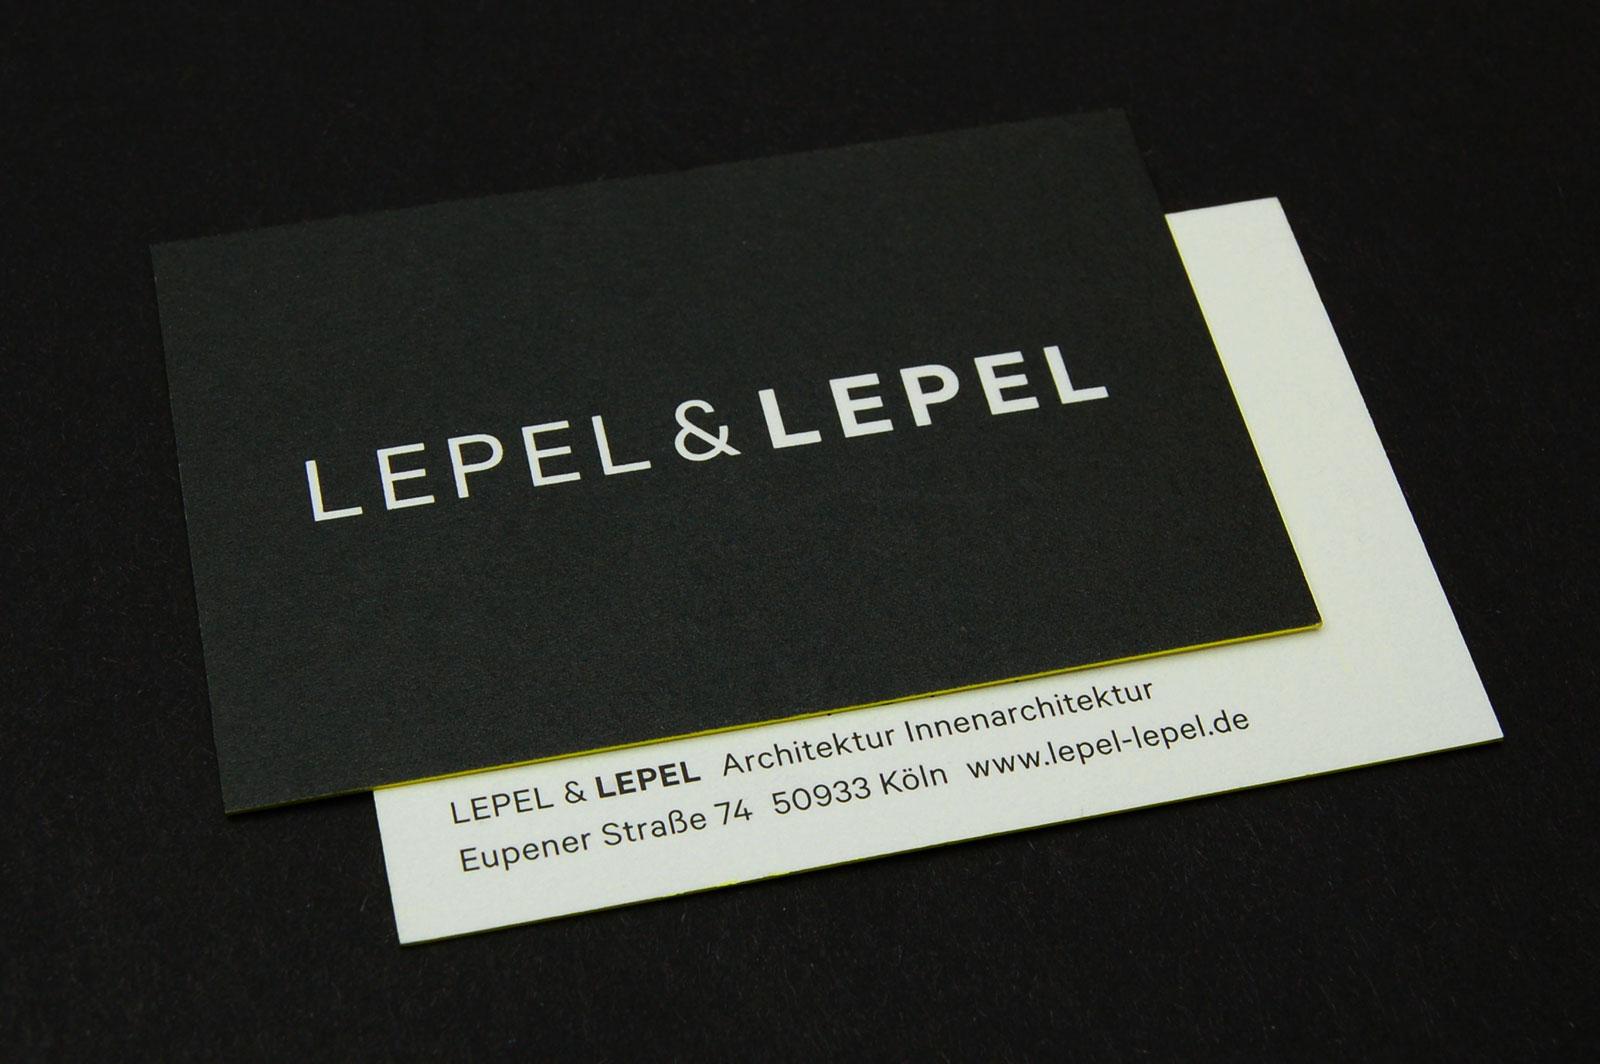 Designbüro Mittelsdorf Lepel & Lepel → Corporate Design, Geschäftspapiere, Redesign